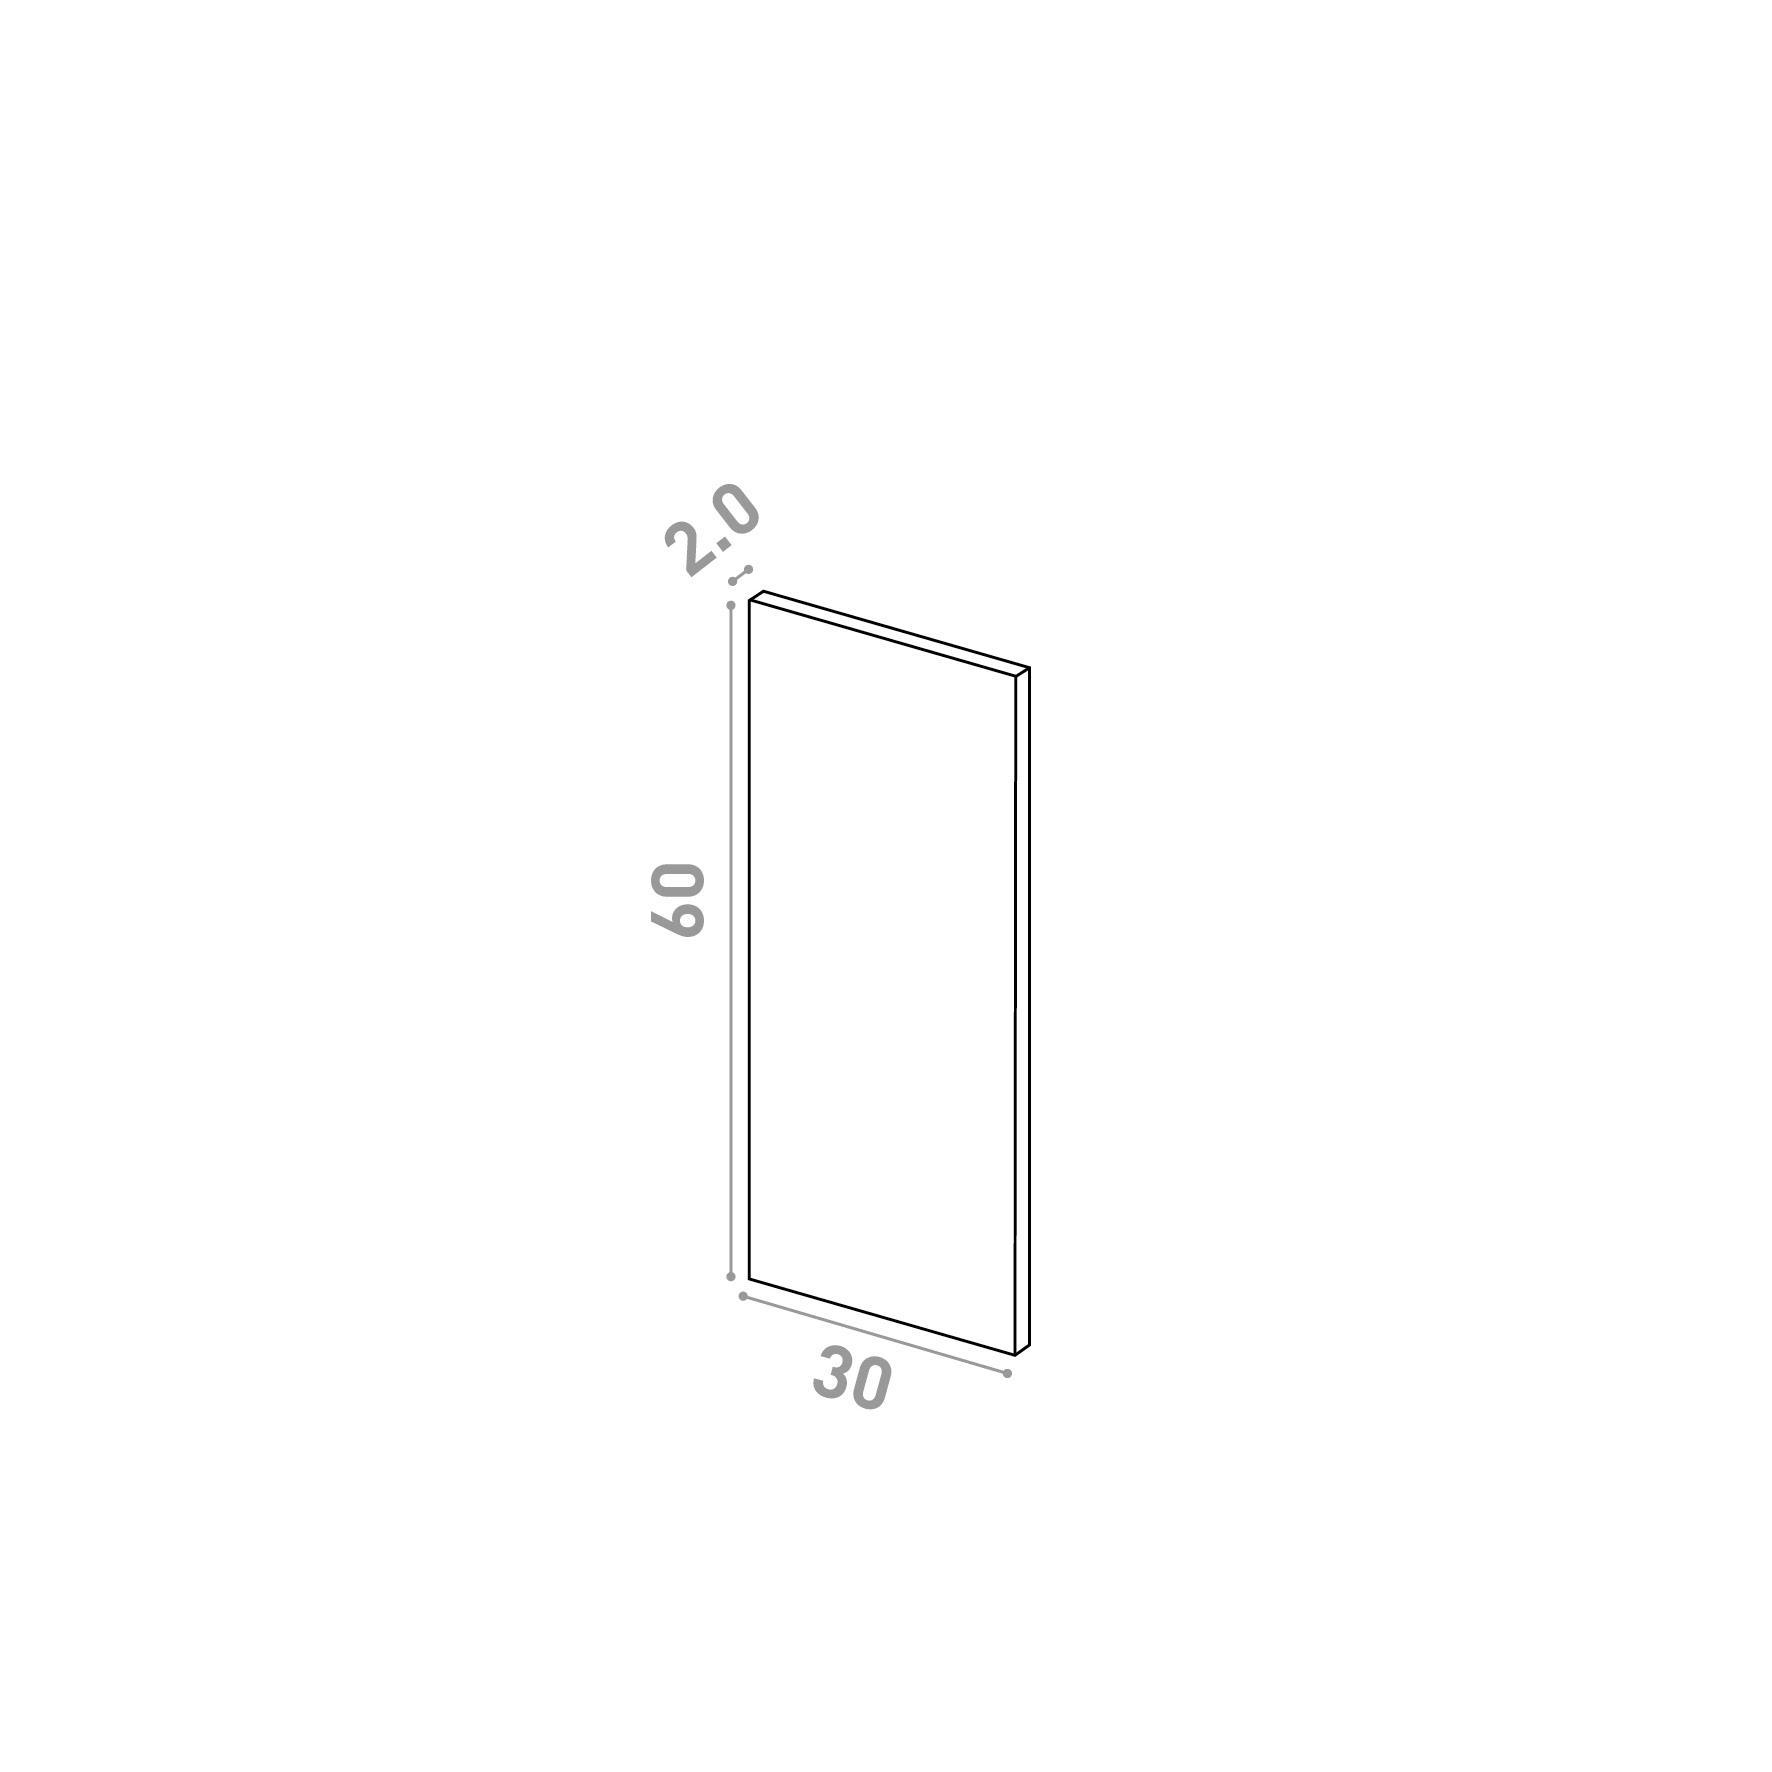 Porte 30X60cm   design lisse   chêne naturel